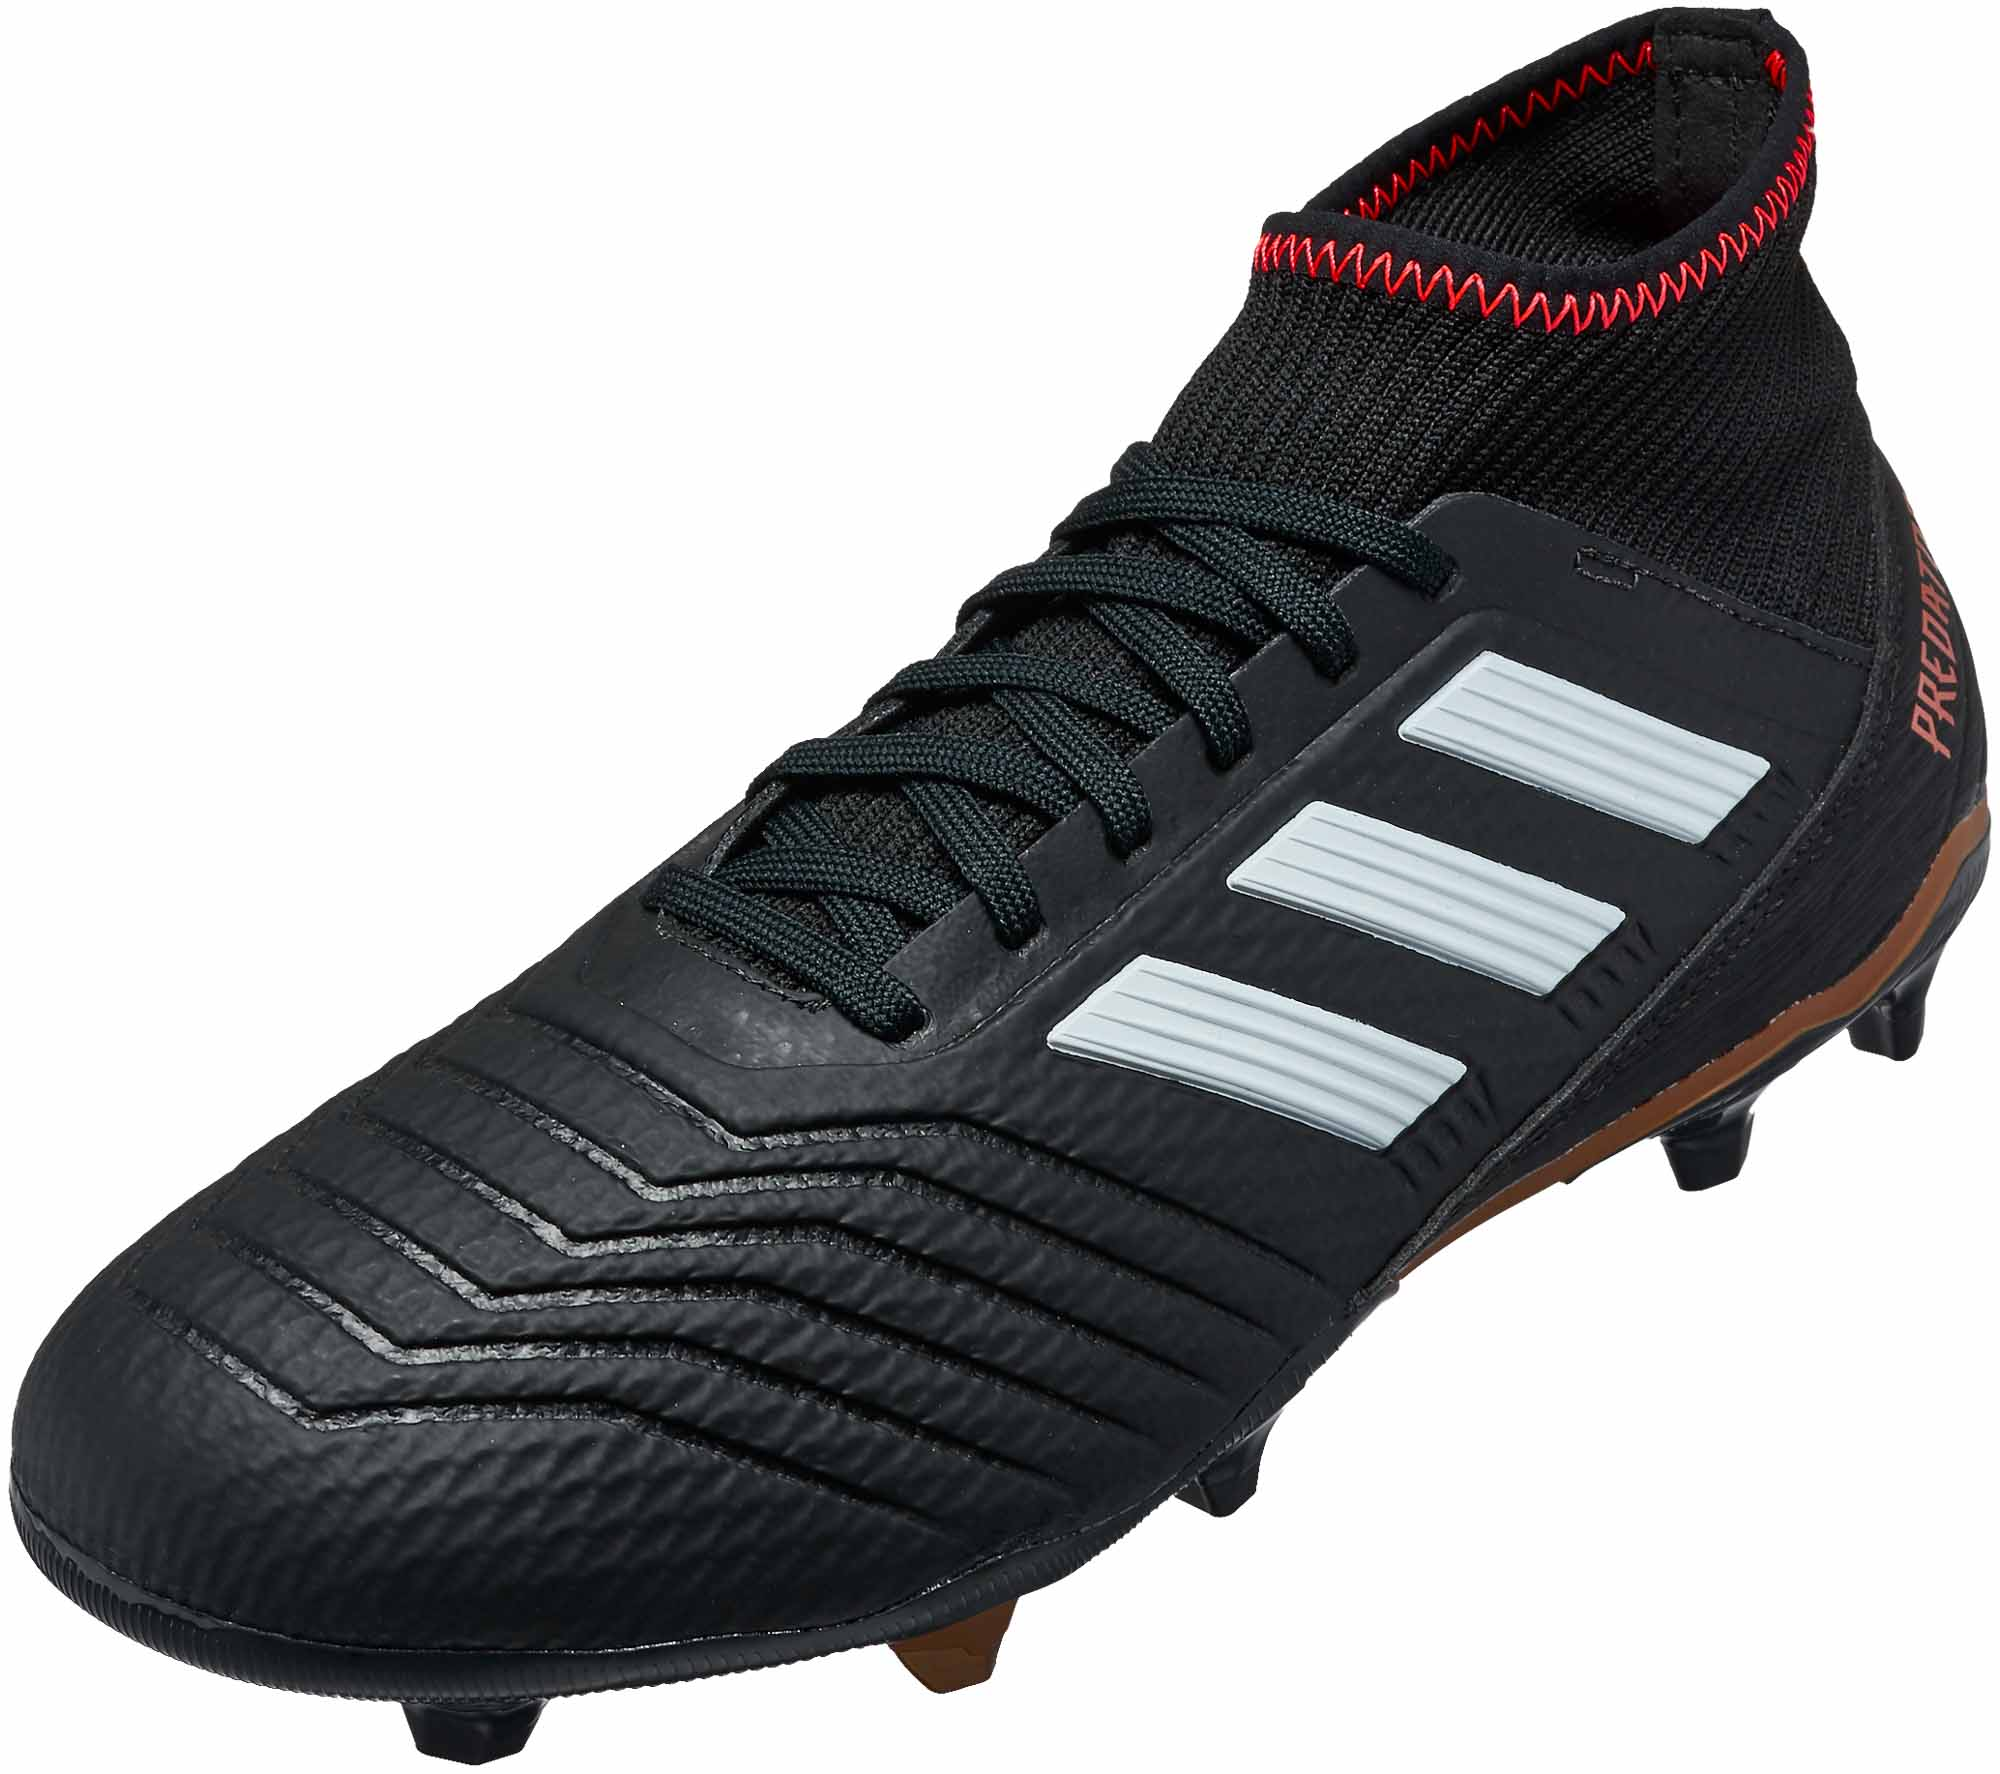 half off 9efa5 d8488 adidas Predator Soccer Shoes - Firm Ground, Turf...  SoccerMaster.com